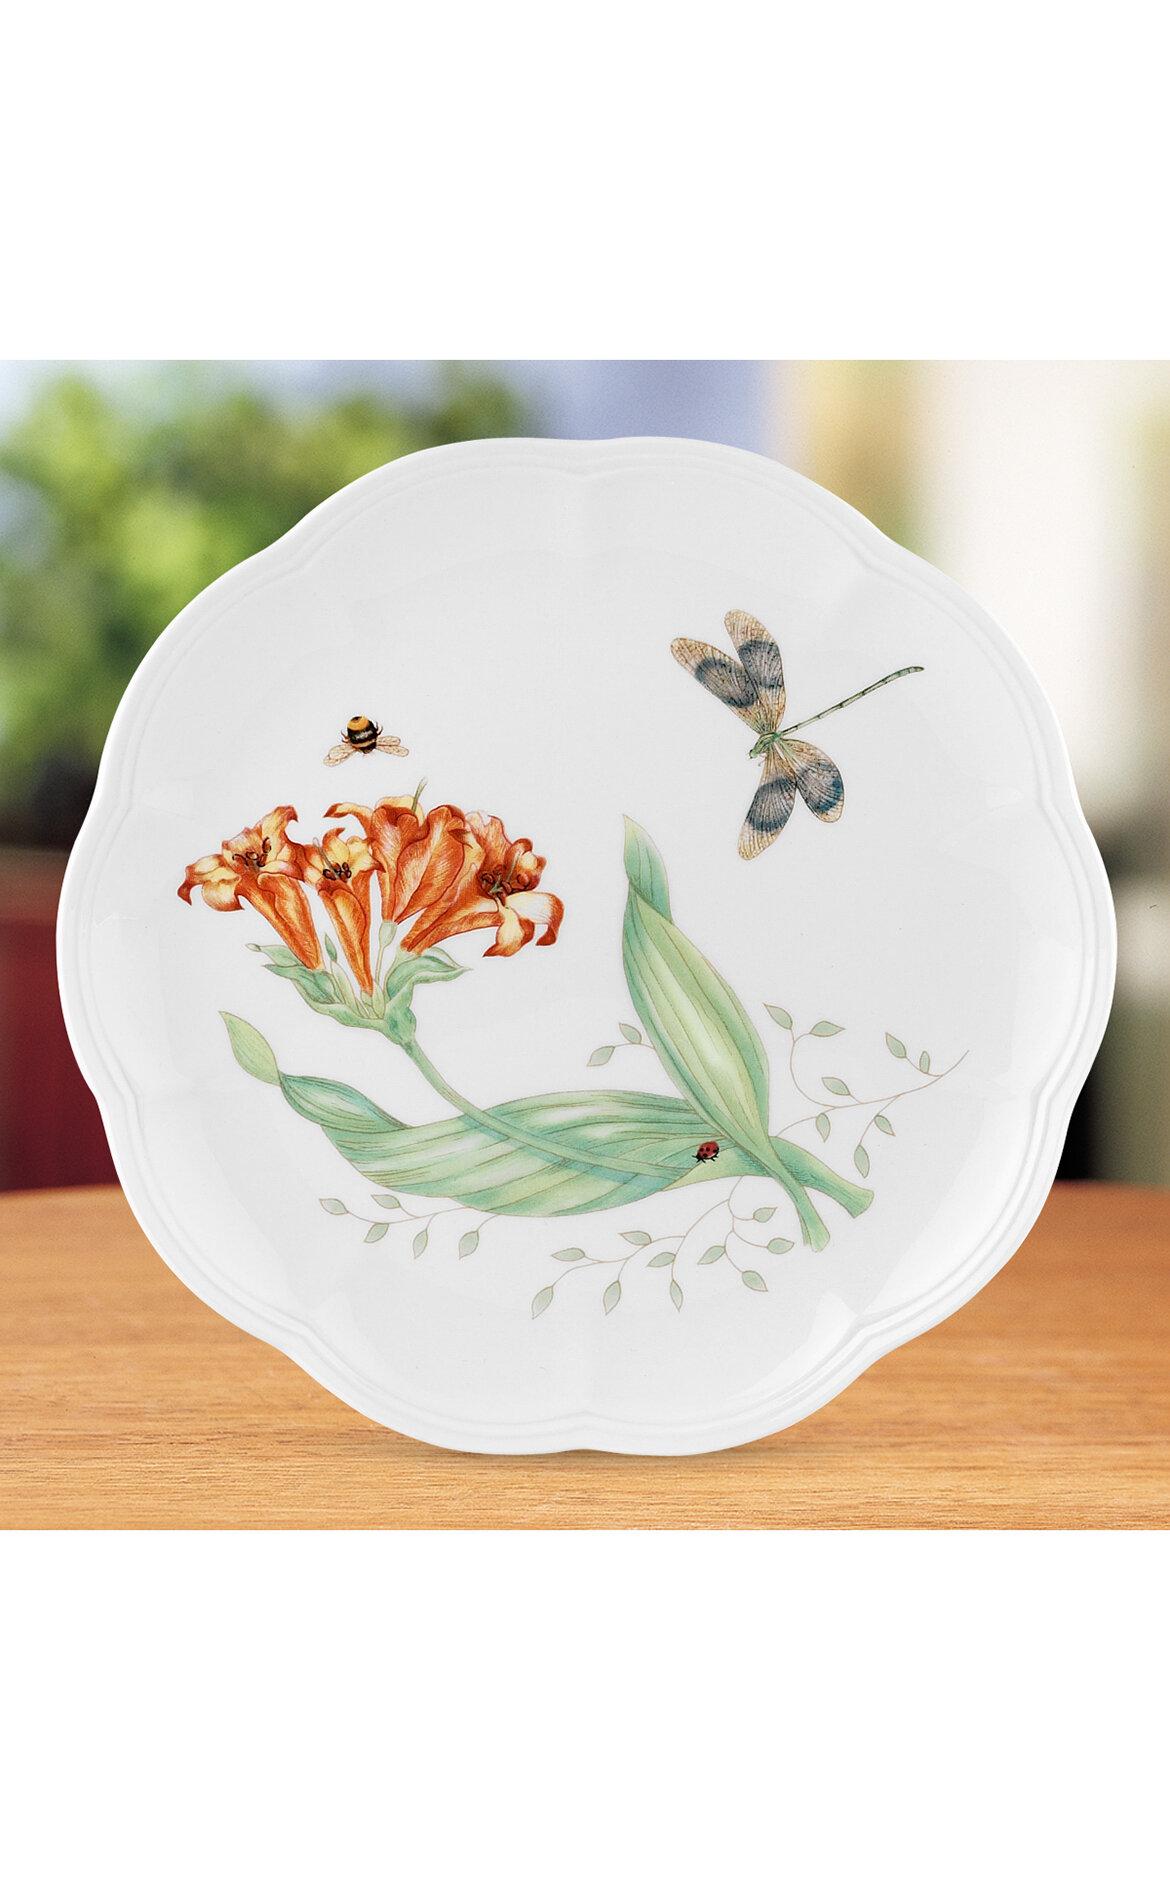 Lenox Butterfly Pasta Tabağı, Dragonfly - 23 cm